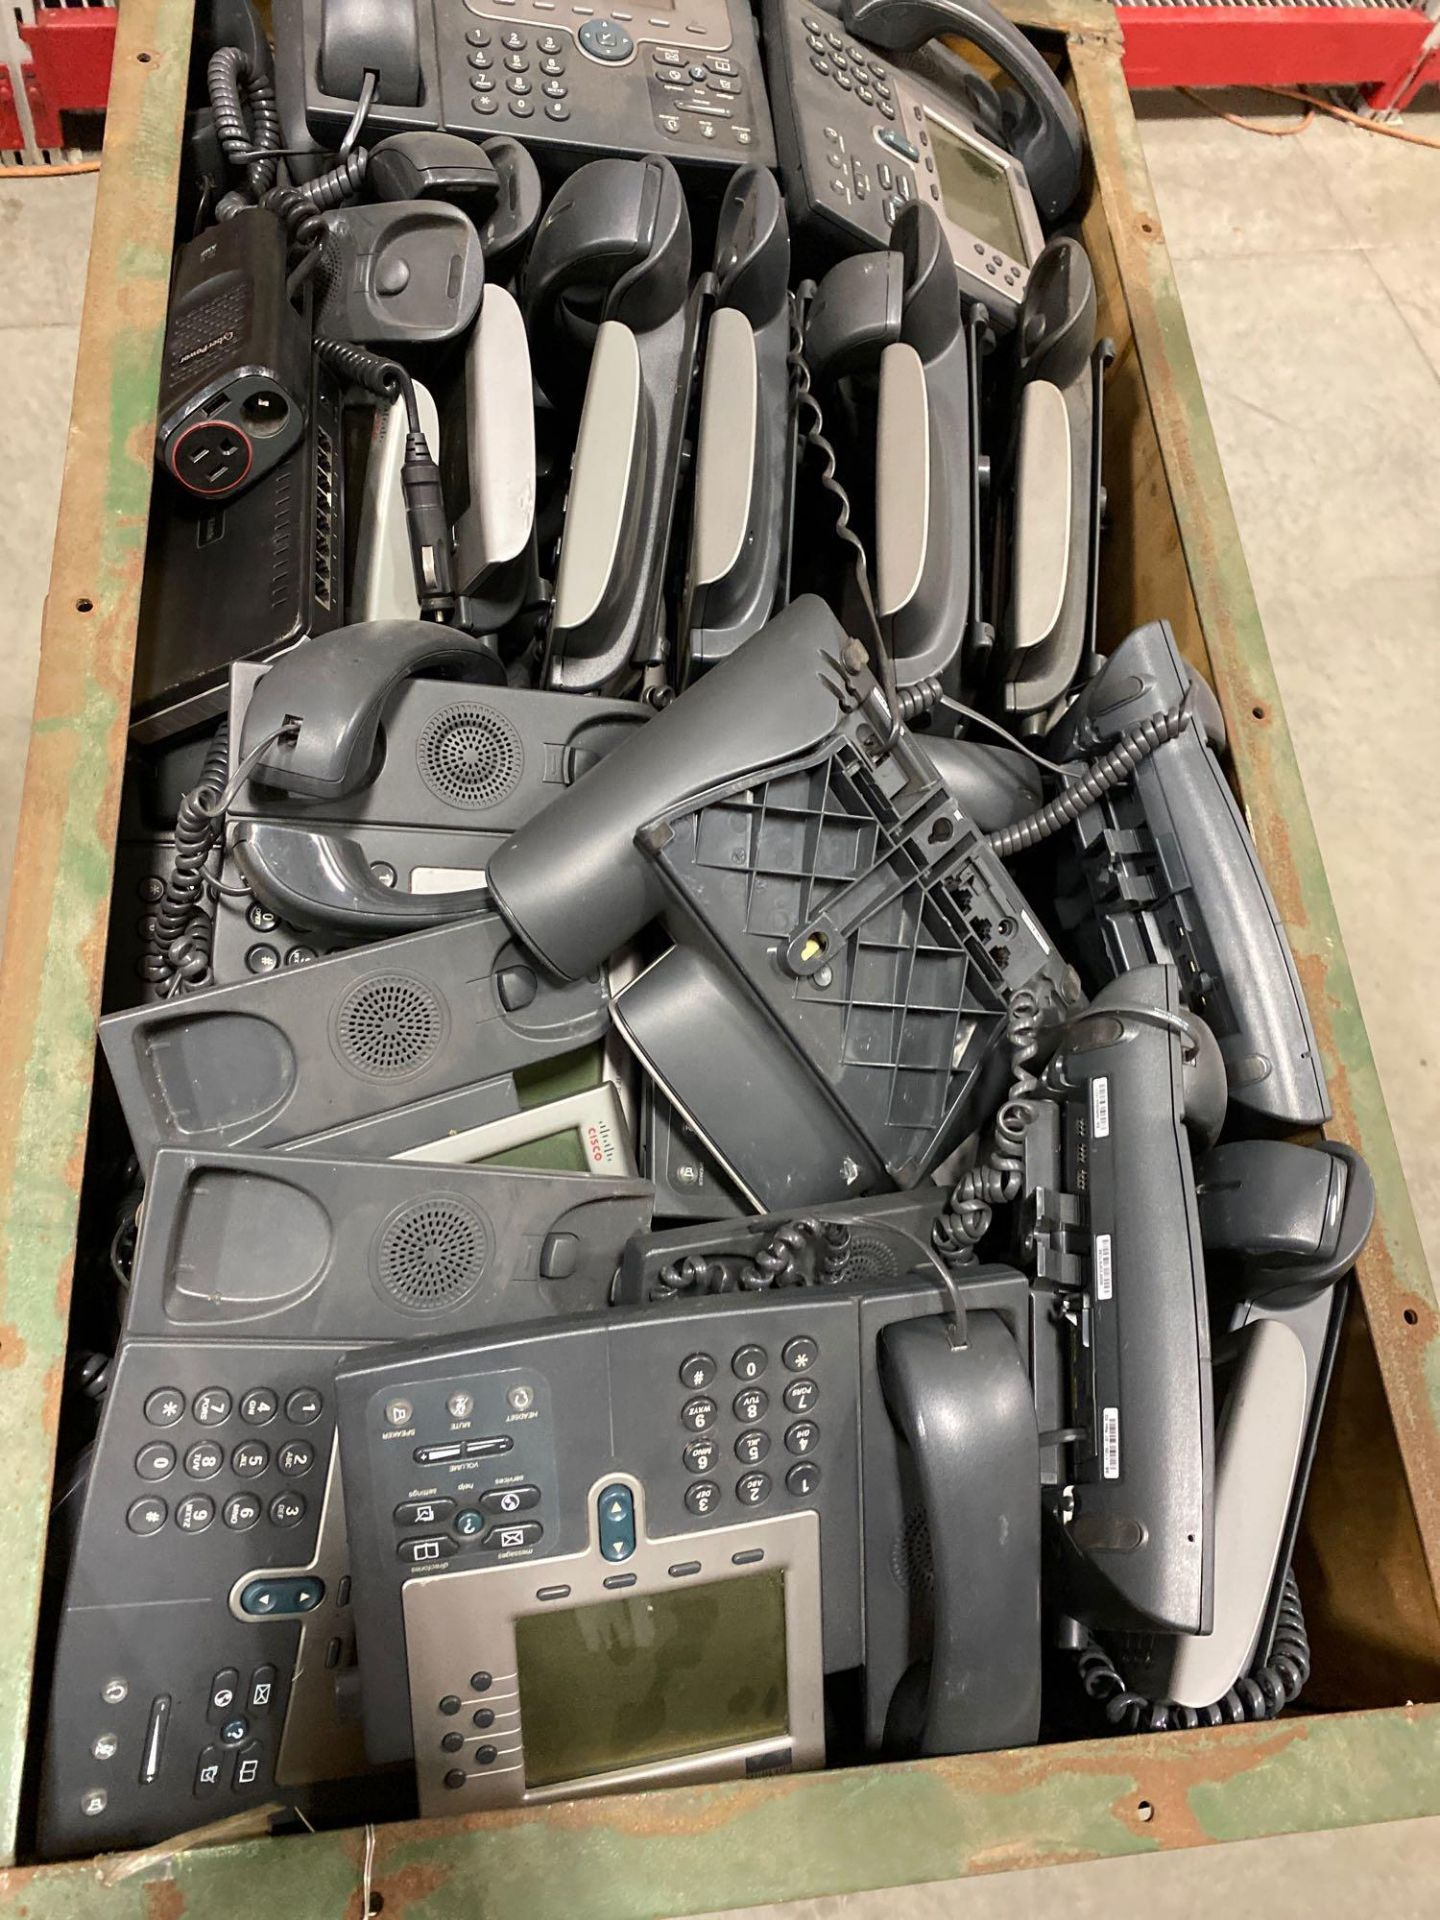 Lot 142 - TWO CRATES OF CISCO IP PHONES